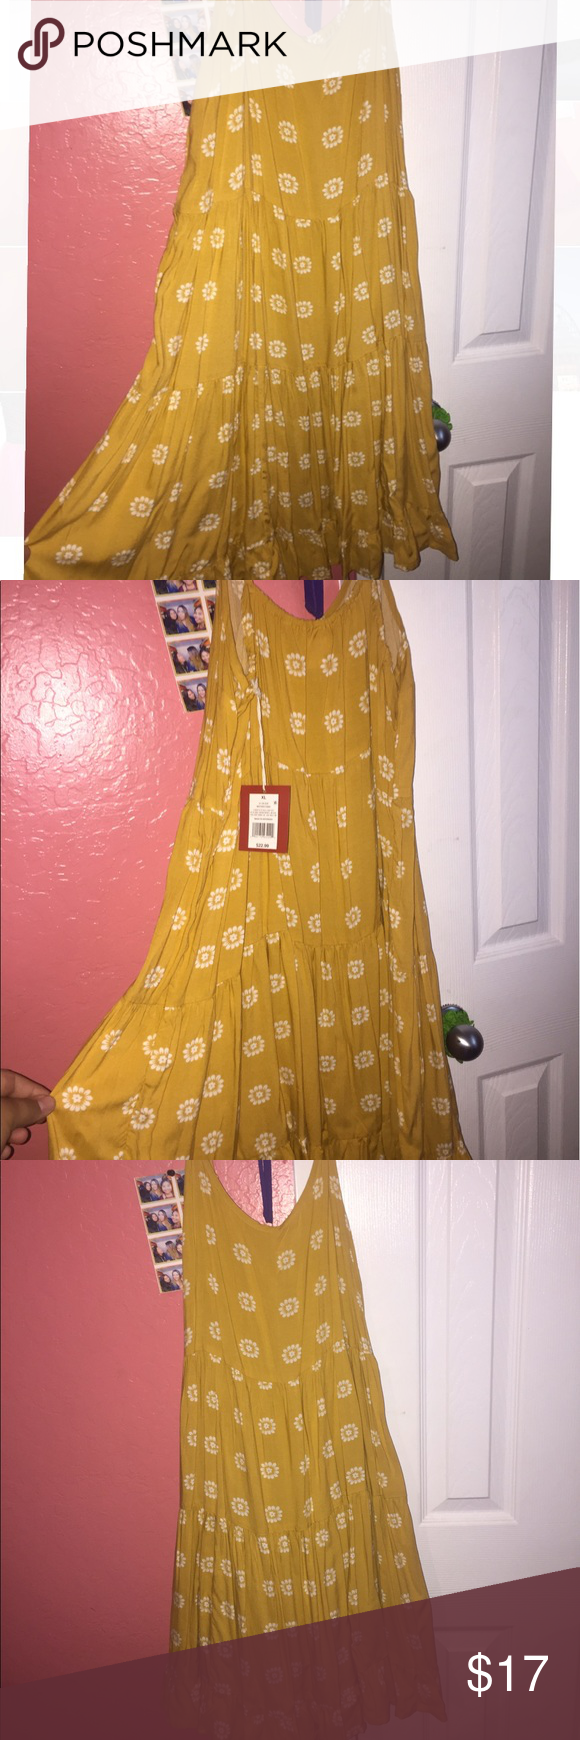 Sunflower dress Golden sunflower dress. Never worn. Perfect condition. :) Dresses Midi